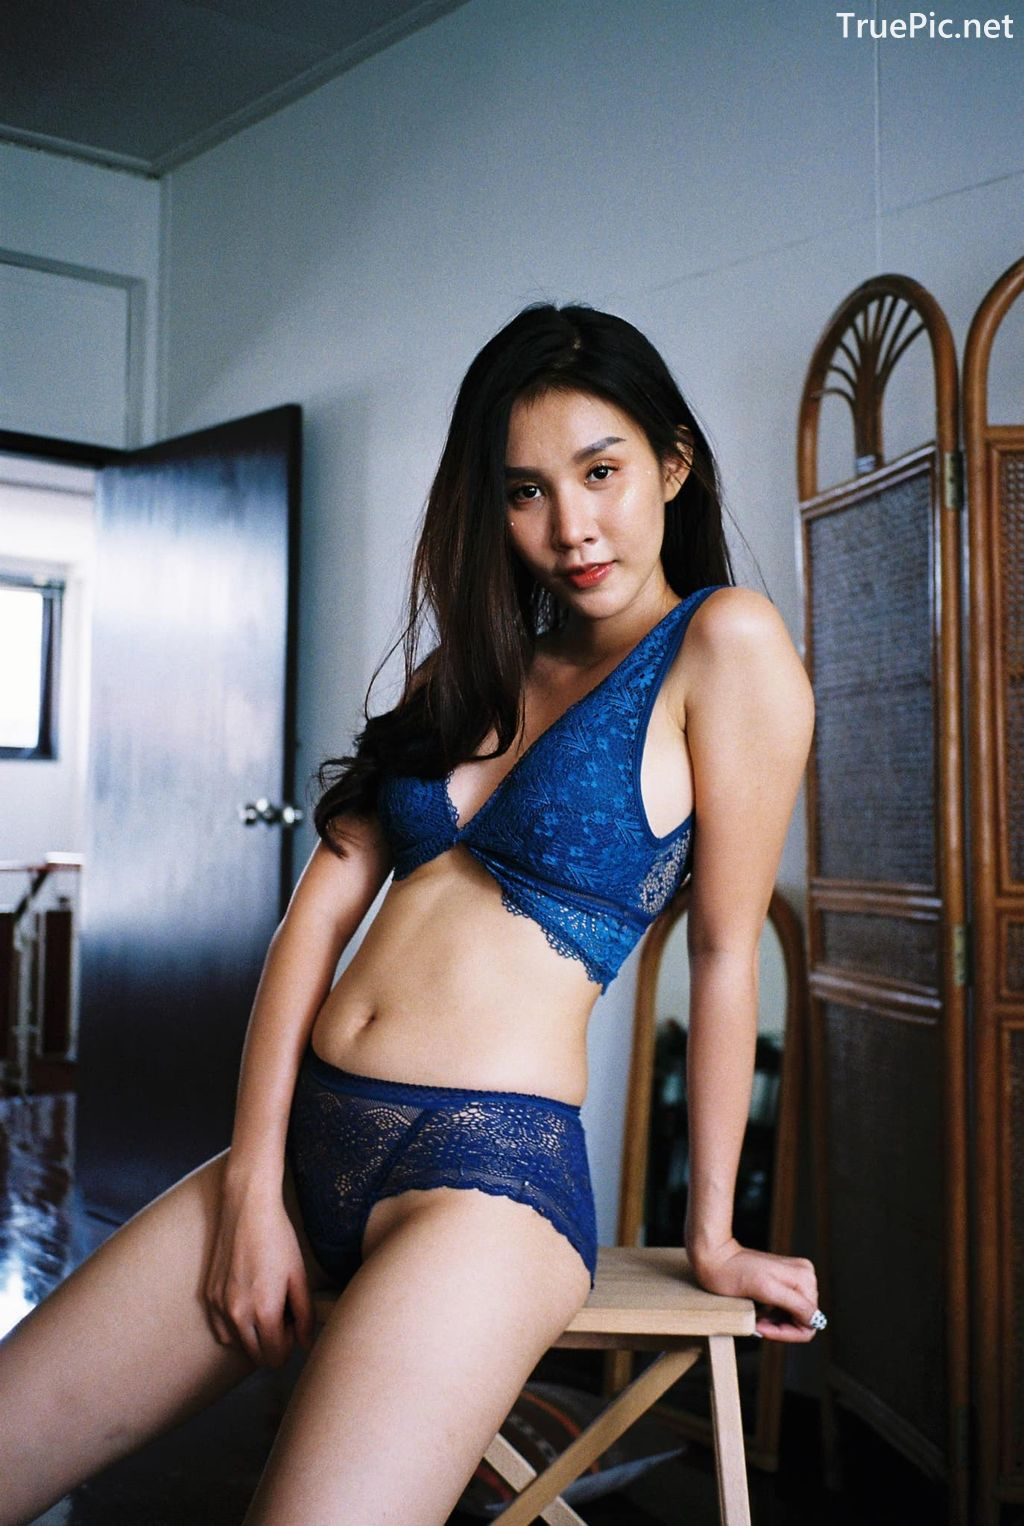 Image-Thailand-Model-Ssomch-Tanass-Blue-Lingerie-TruePic.net-TruePic.net- Picture-20